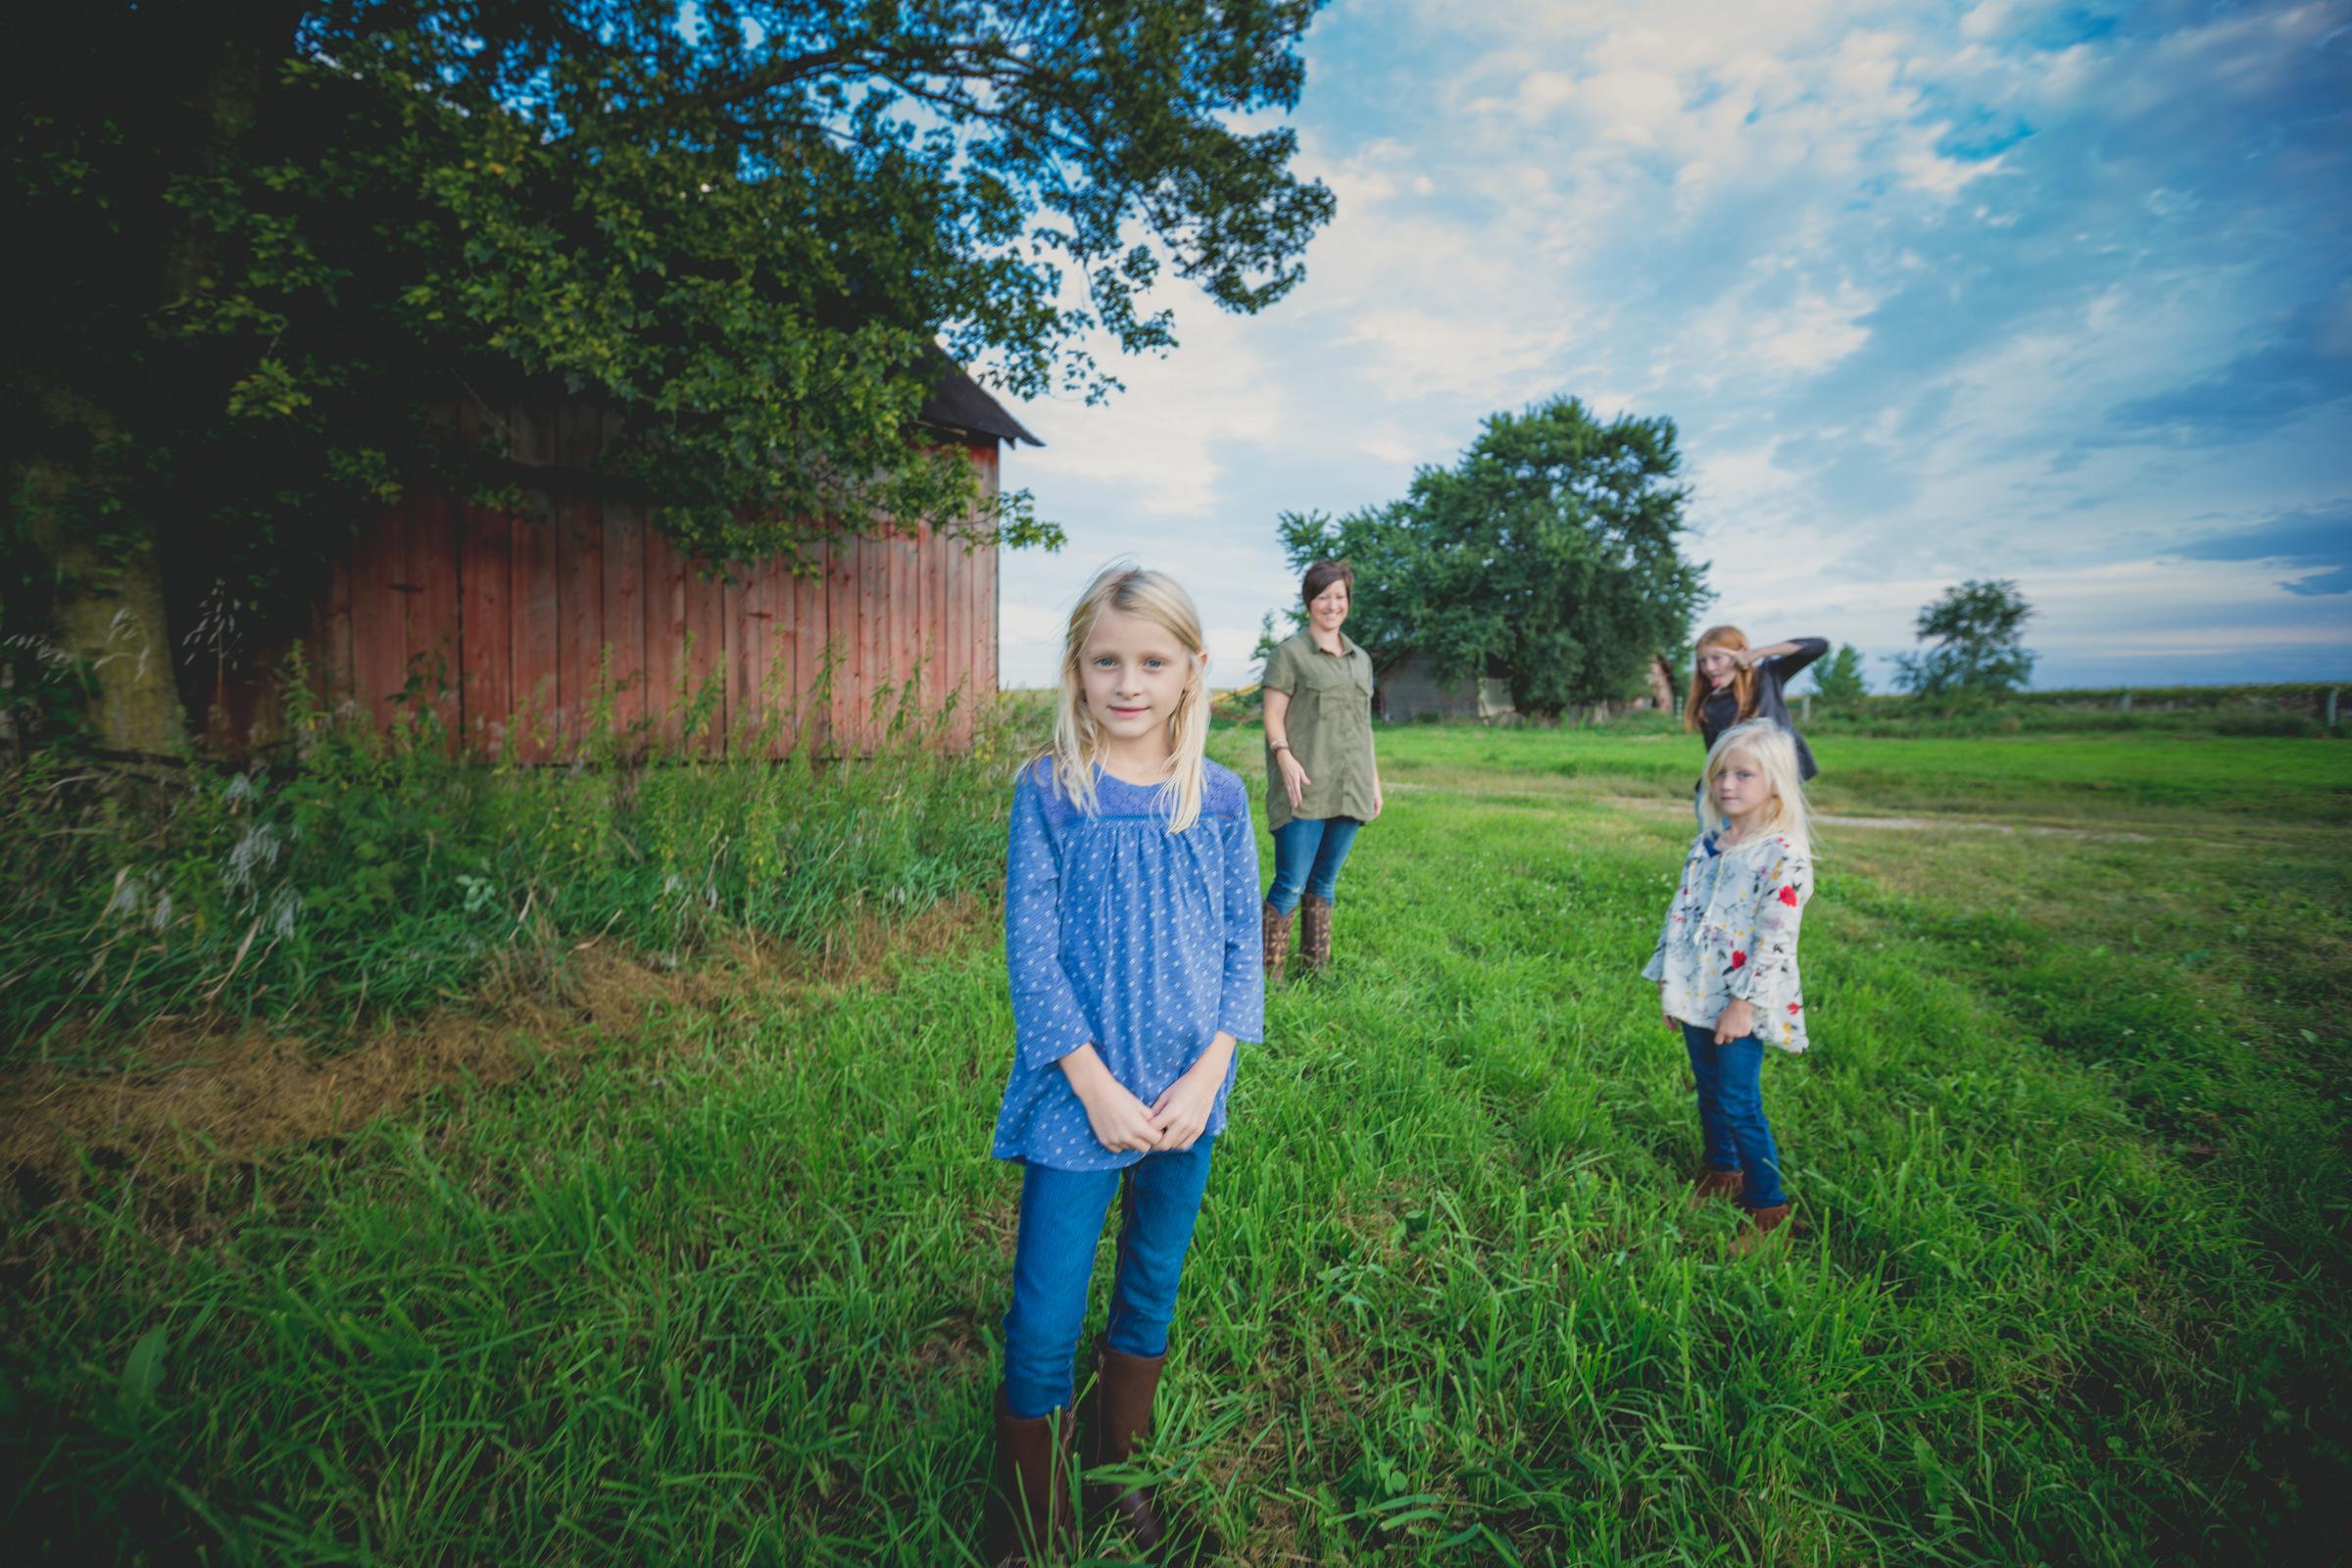 Family portrait north Iowa